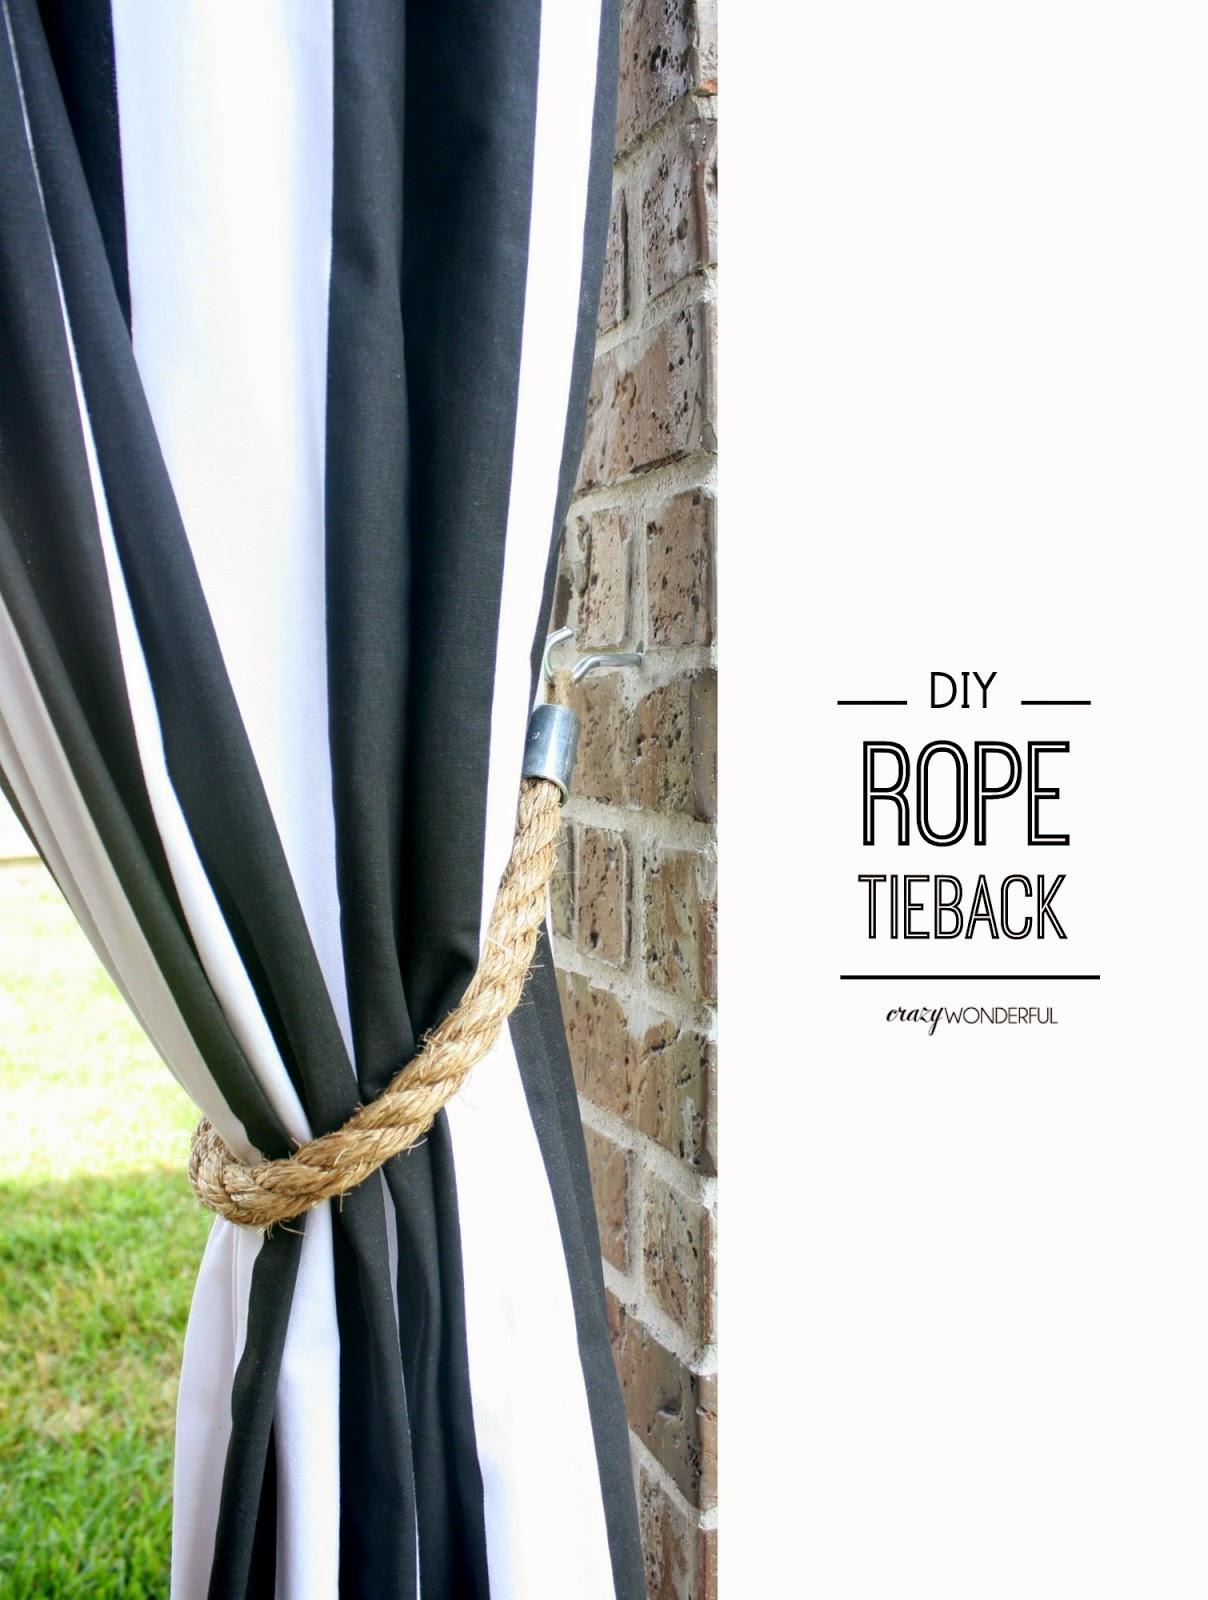 patio curtains + DIY rope tieback. Tuesday, September 16, 2014